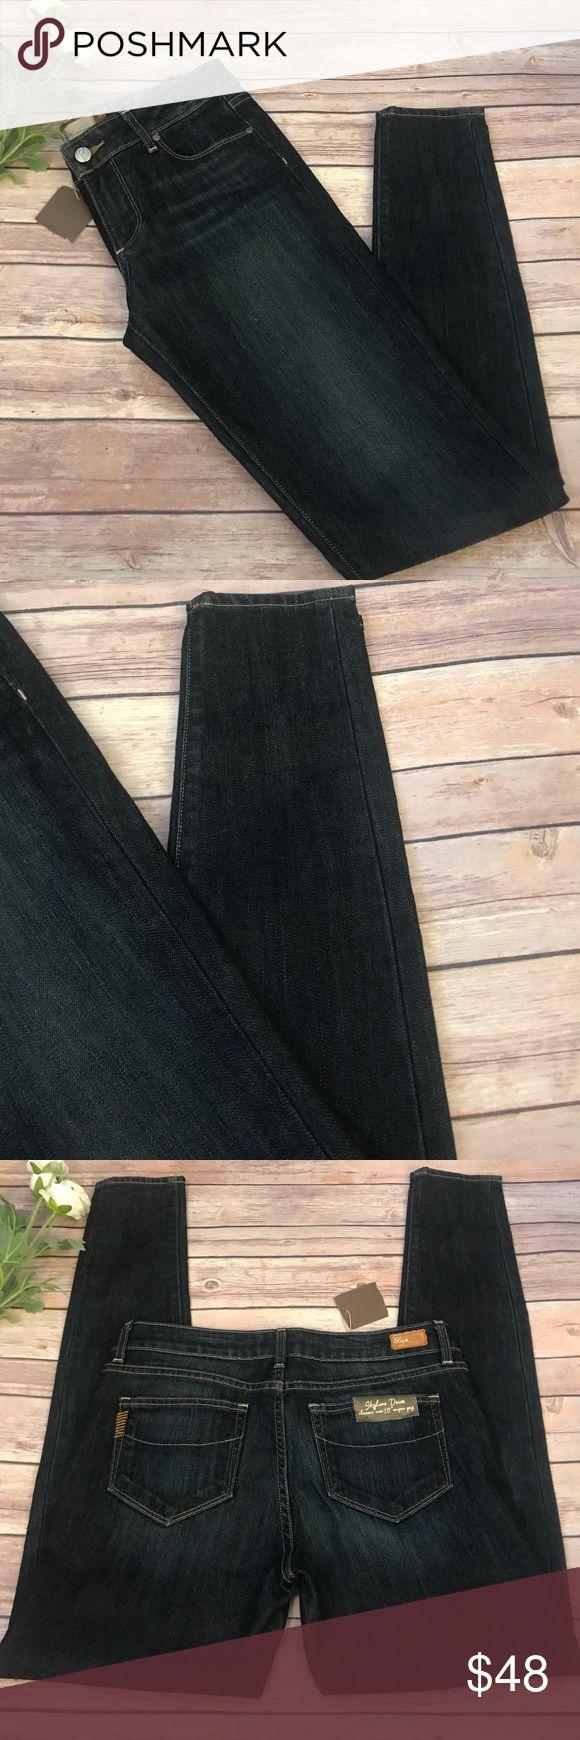 "Paige premium denim New! Skyline Drive"" classic rise 10"" super peg denim jean by Paige Premium denim. Dark blue with whisker wash fade. Classic hard denim peg ankle bottom. 60%cotton: 40% polyester. Paige premium denim Jeans Skinny"